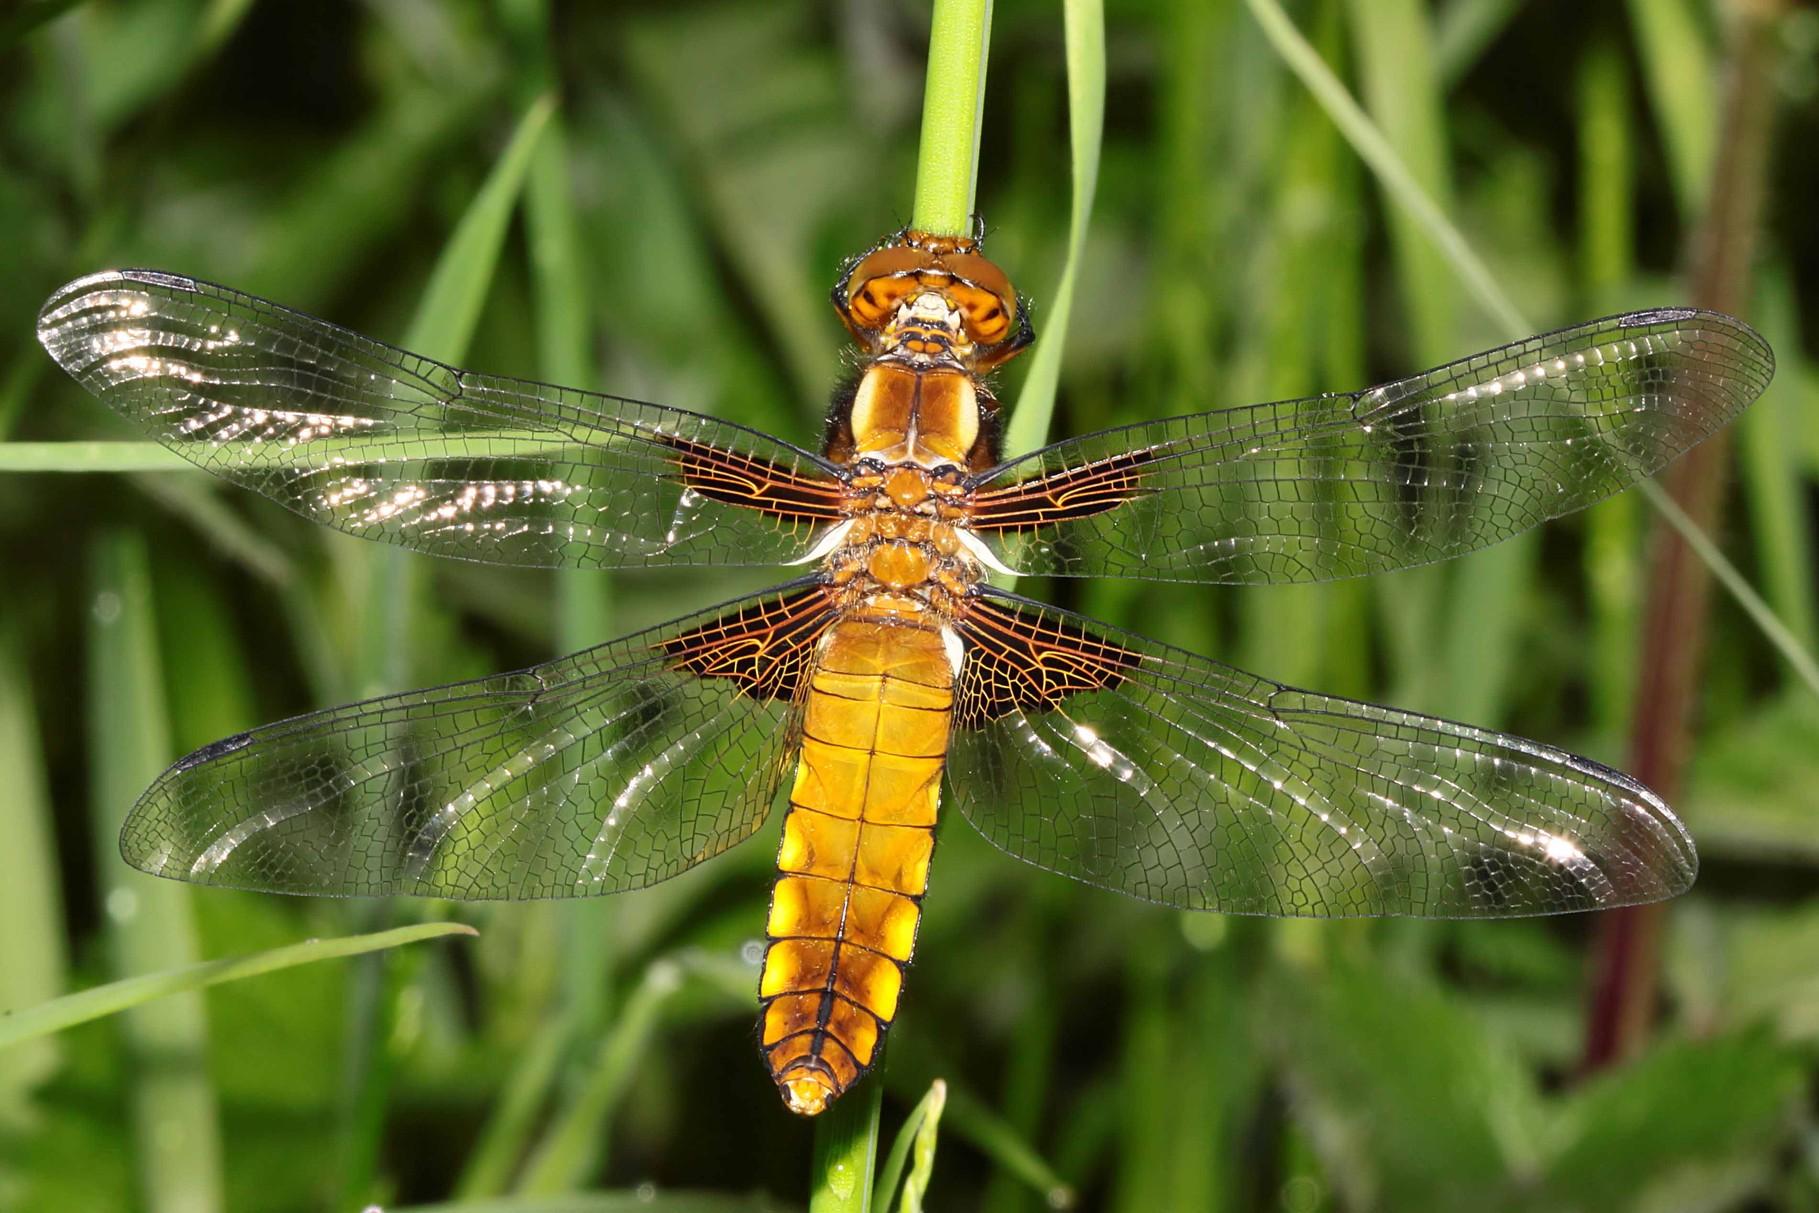 Plattbauch (Libellula depressa), Weibchen.